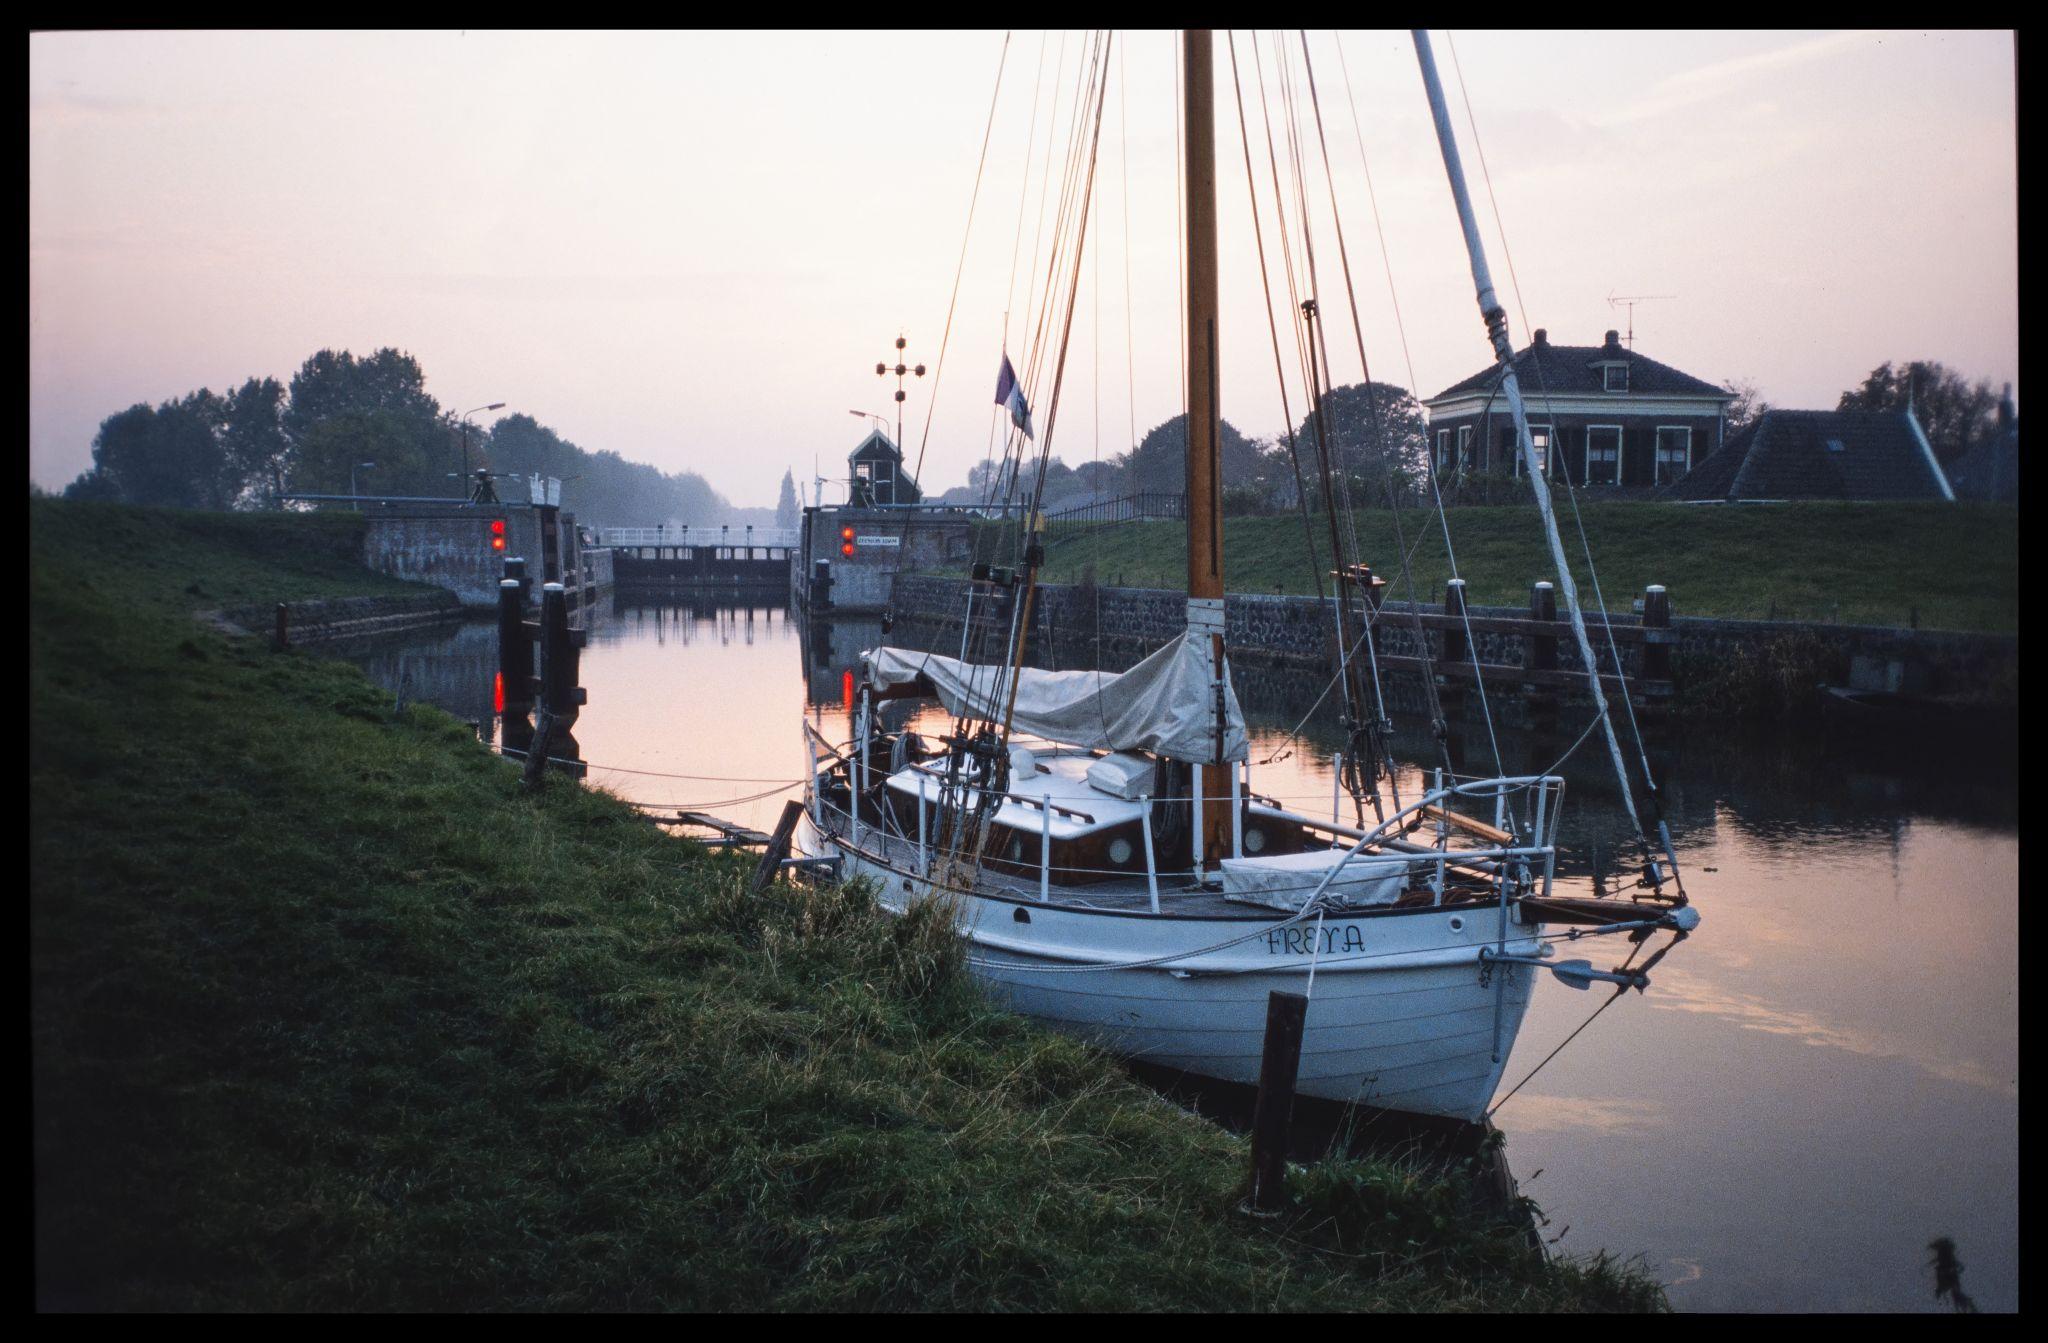 Edam Zeesluis (sea lock), Netherlands